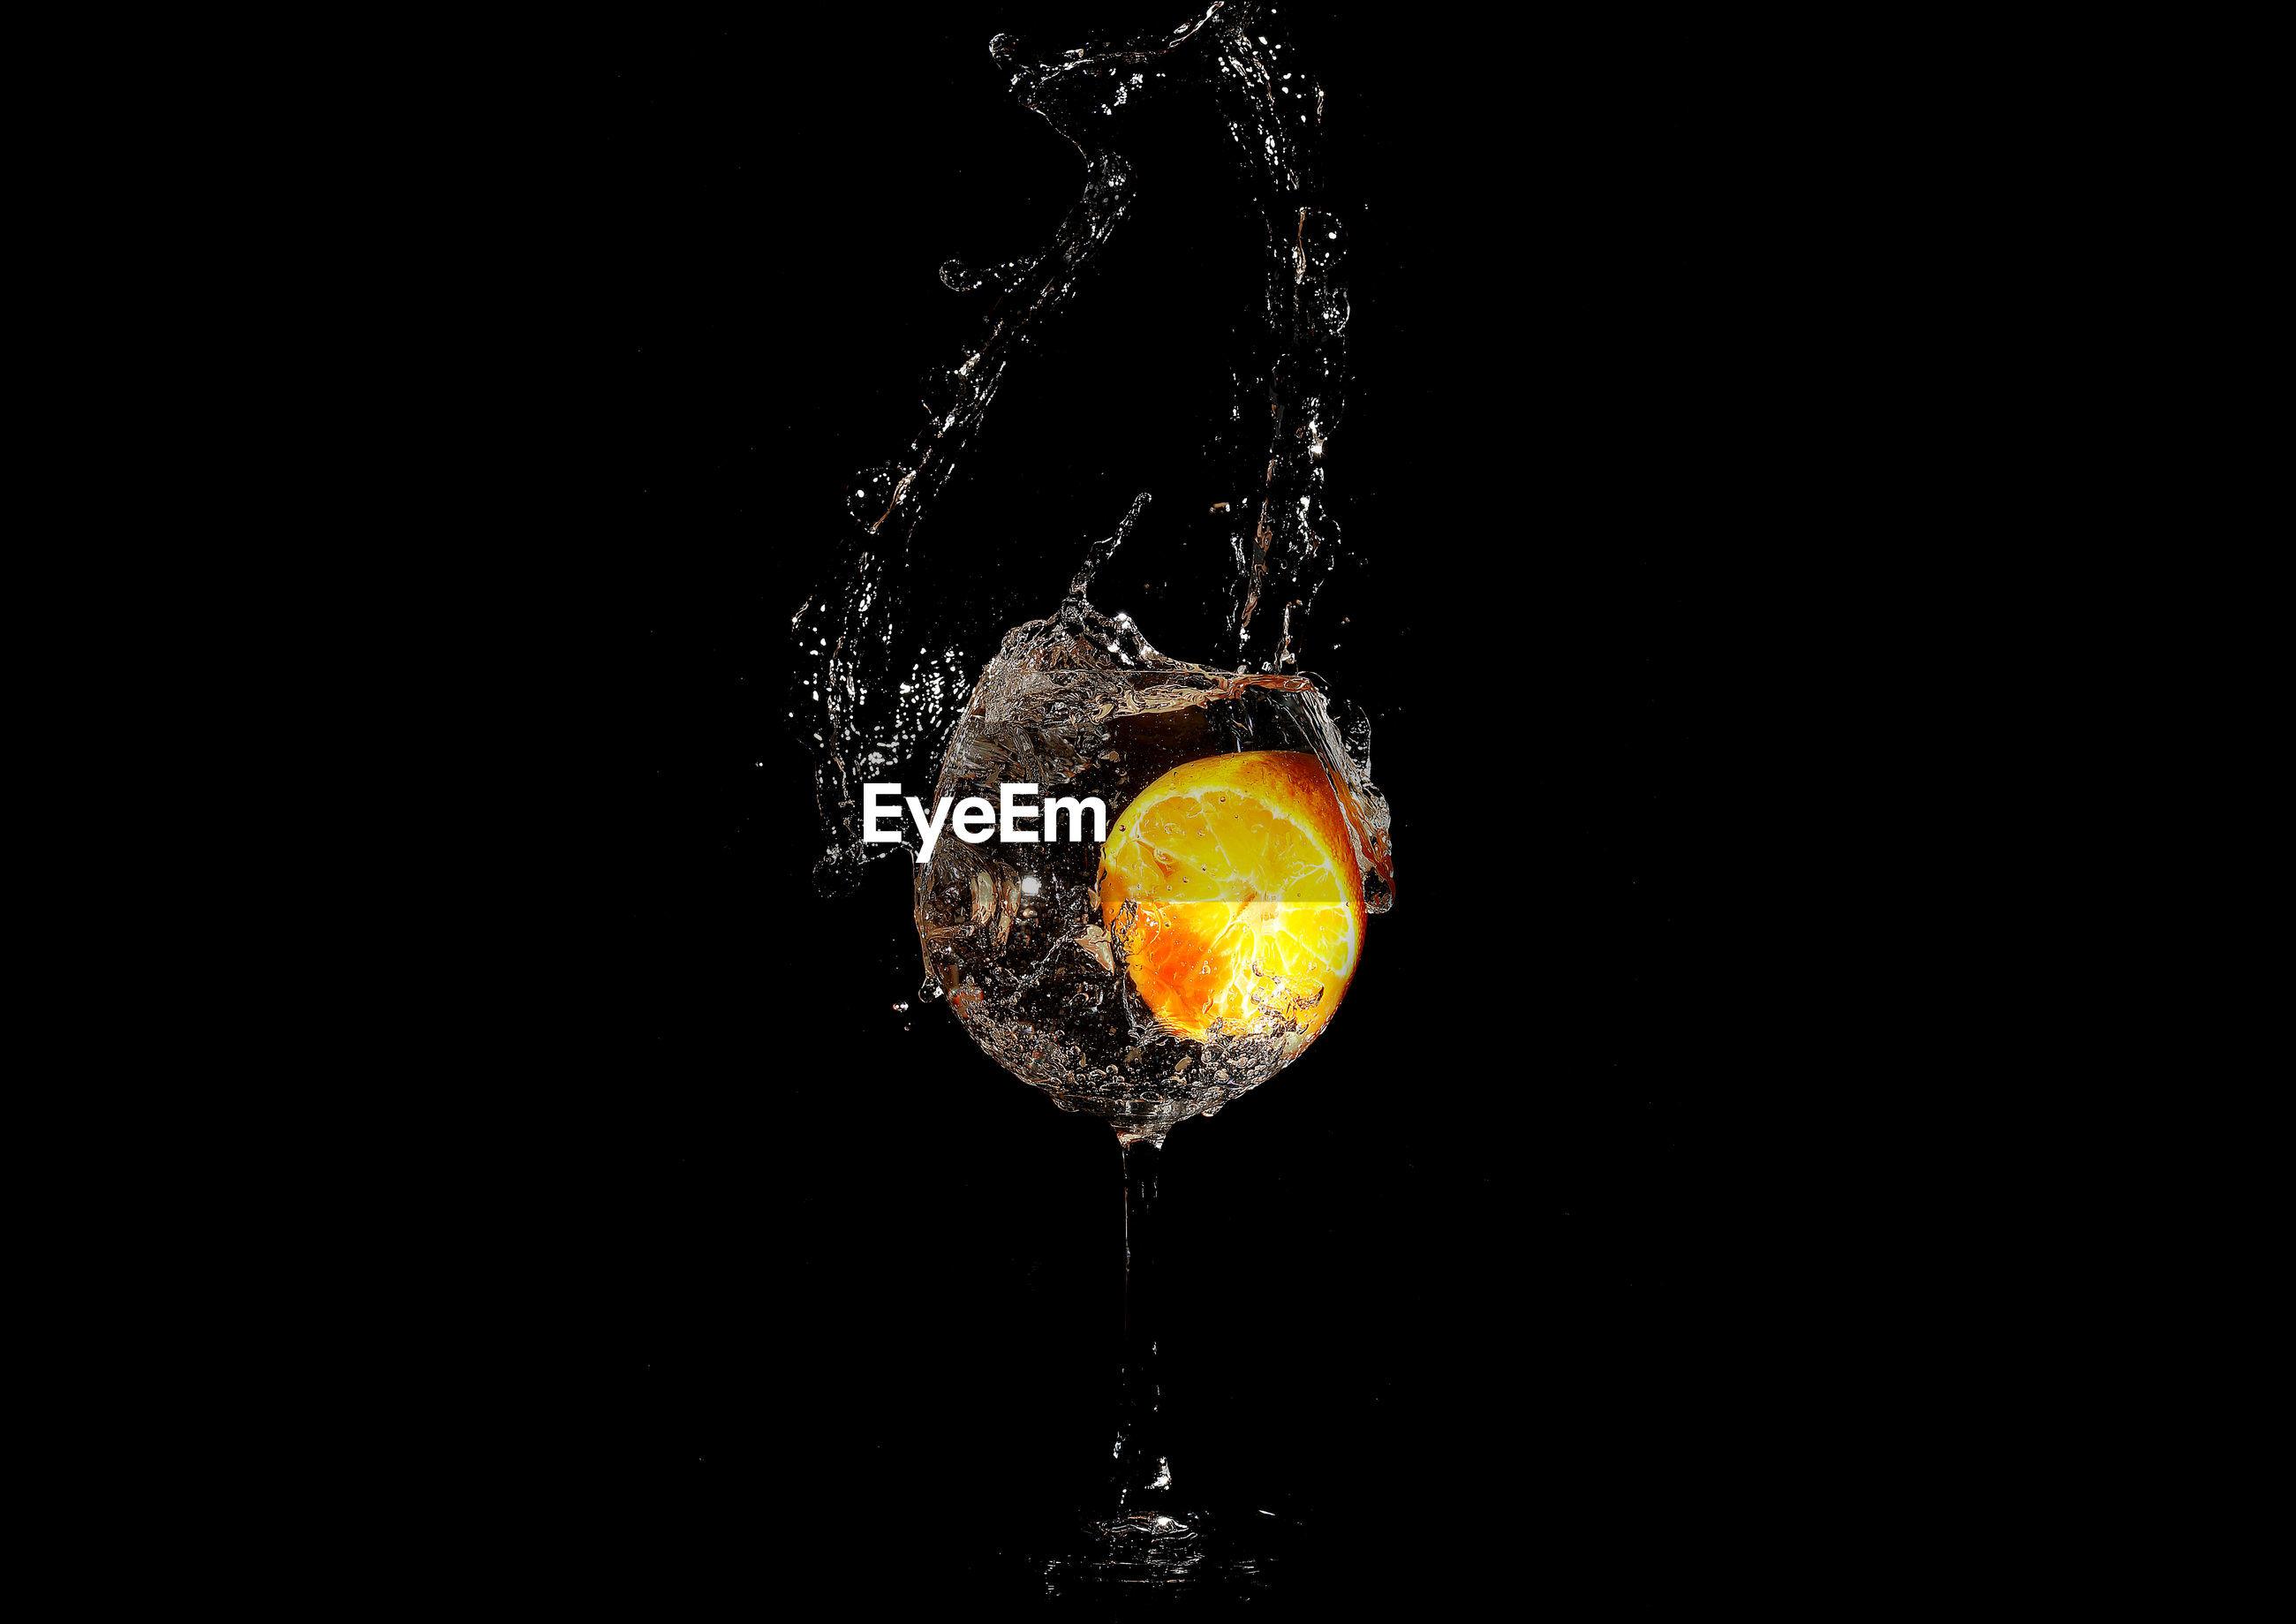 Splashing drink into glass over black background